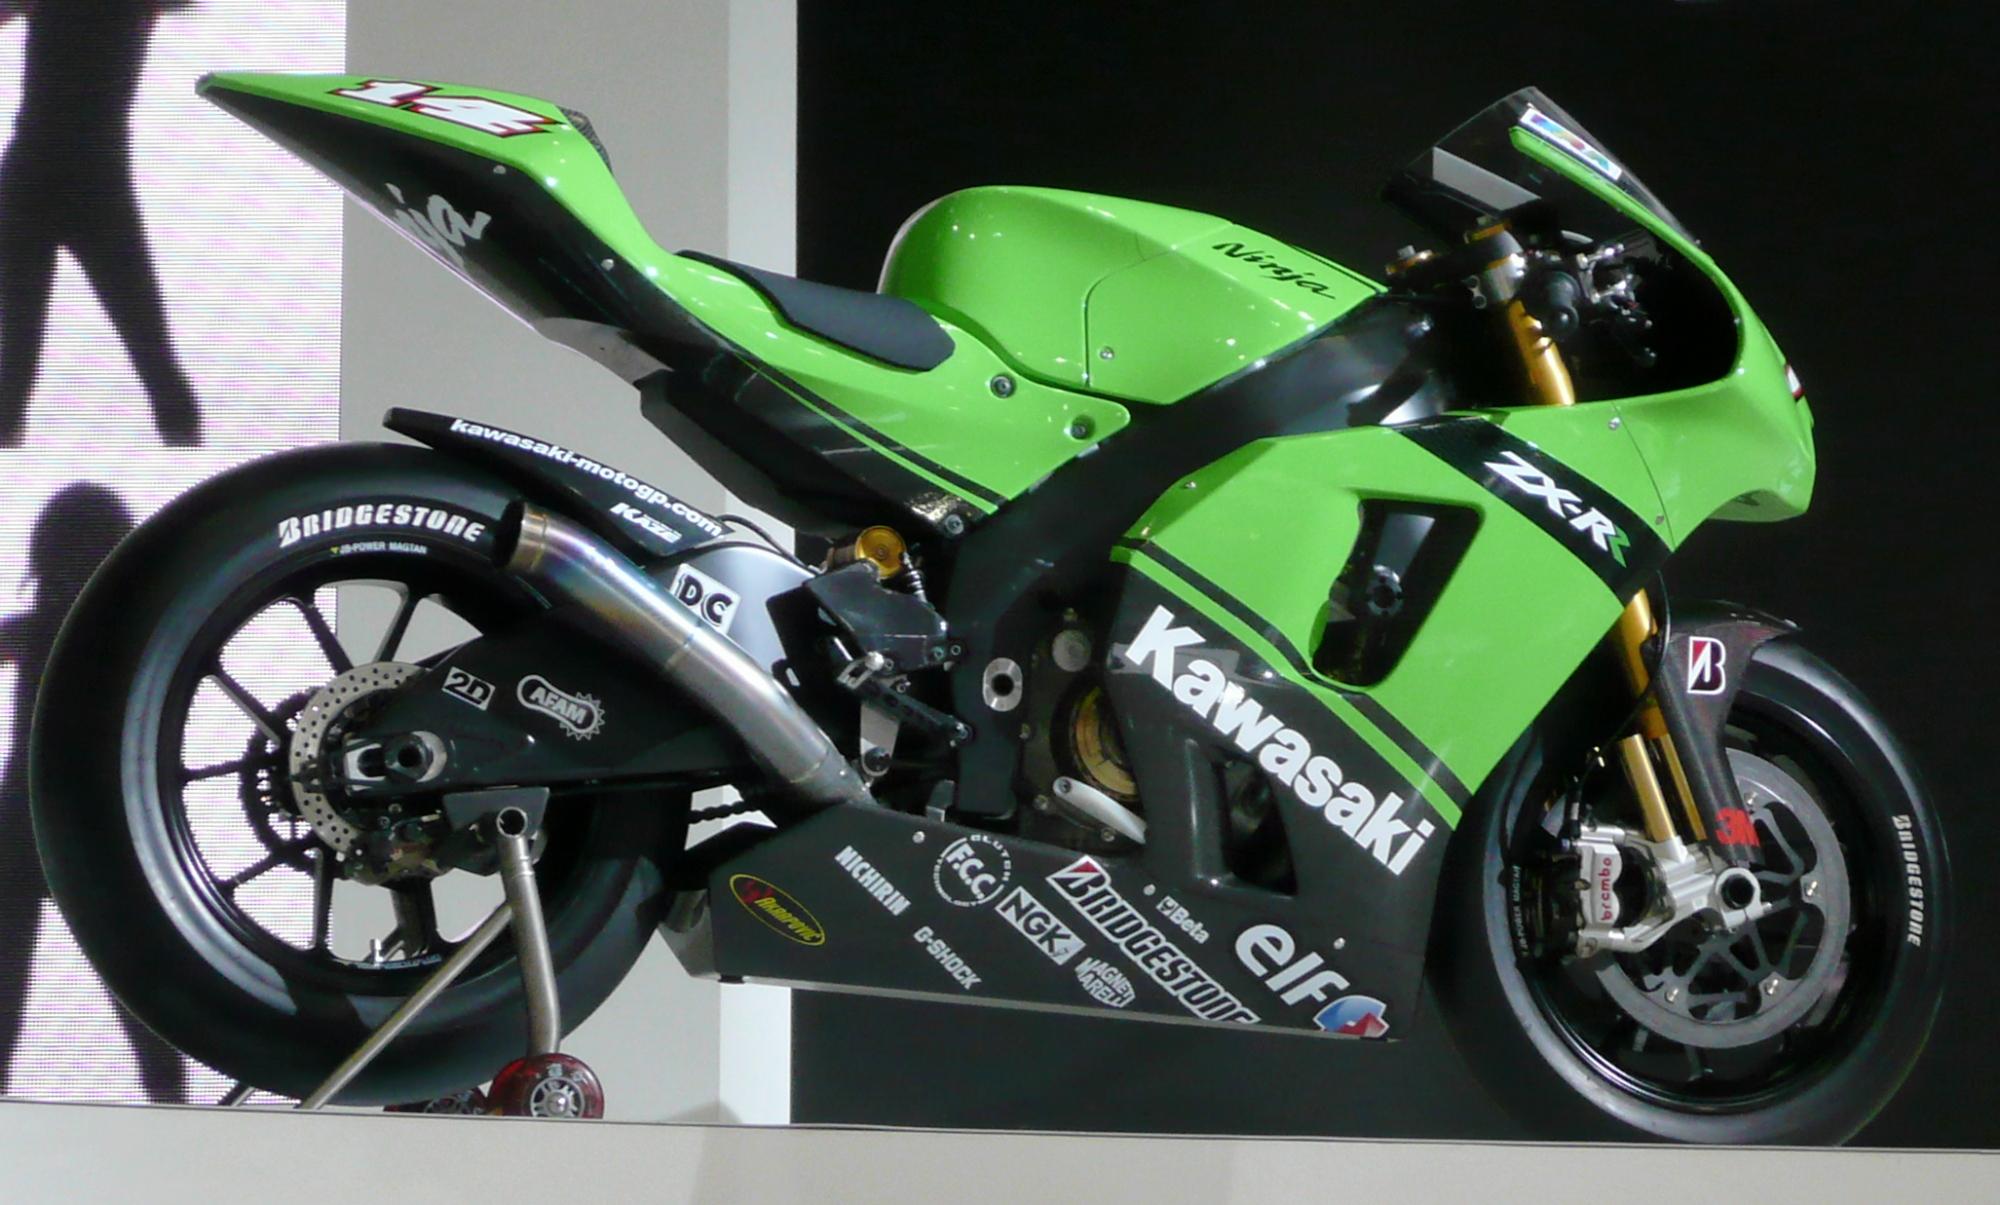 2005 Kawasaki Ninja ZX-RR 990cc MotoGP motorcycle